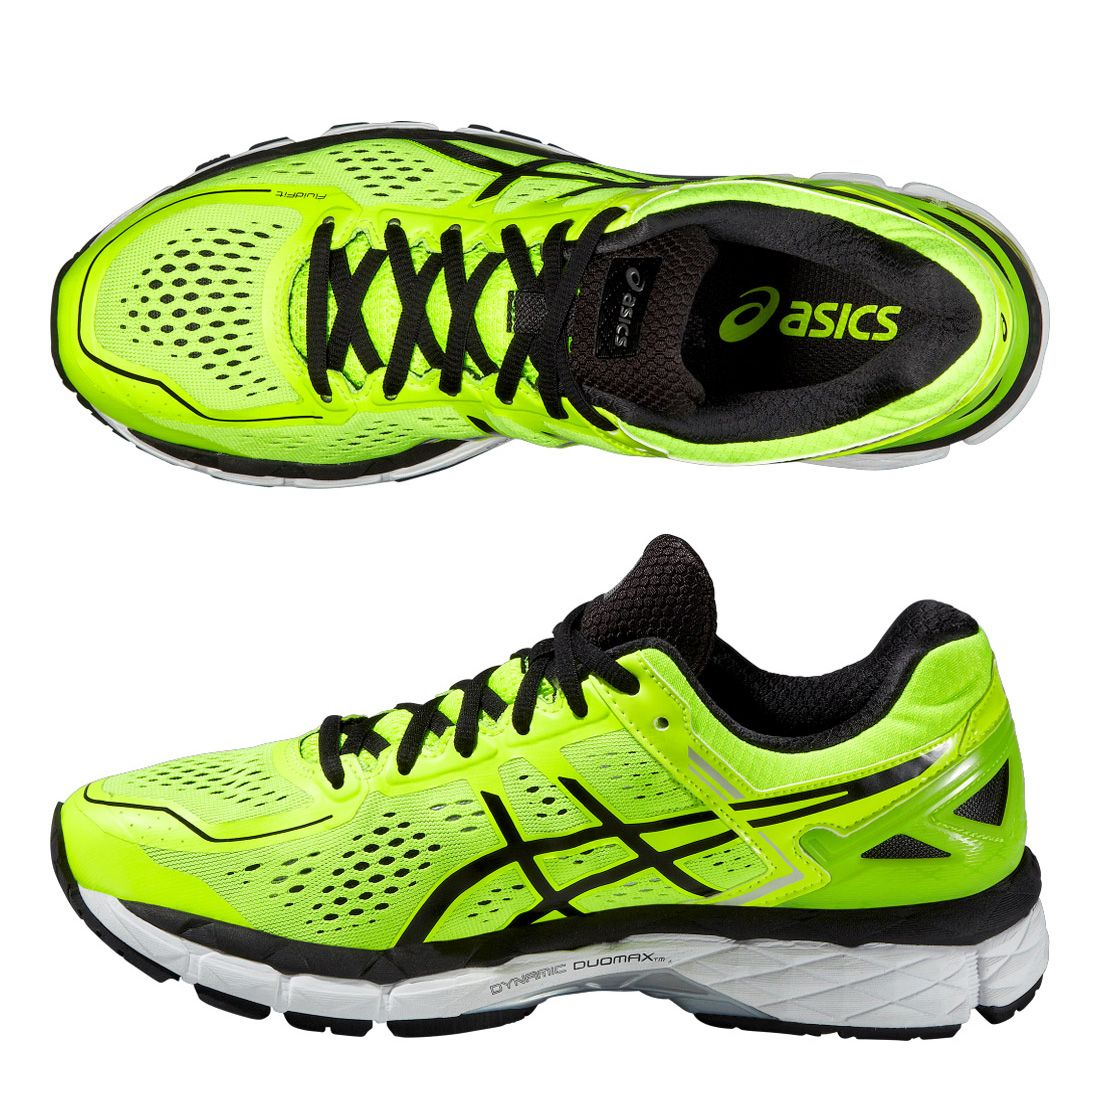 Asics Gel Kayano 22 Mens Running Shoes Sweatband Com